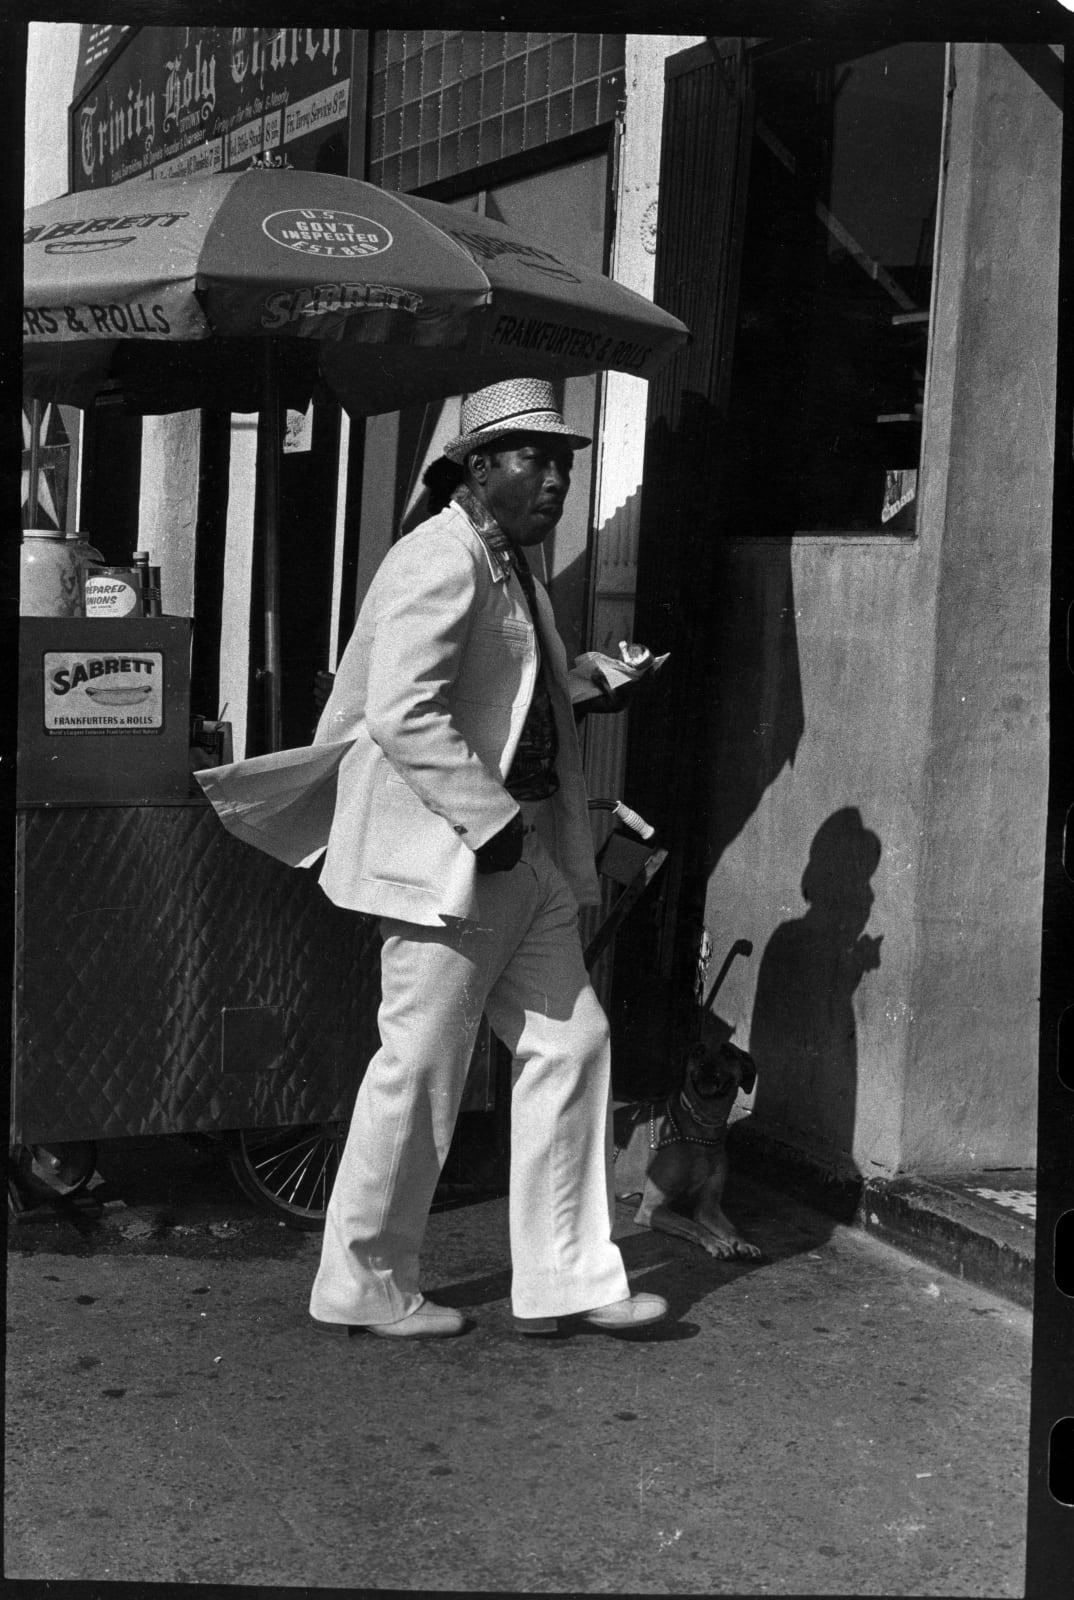 Ming Smith, Homeboy with Snack, Harlem, New York, 1976